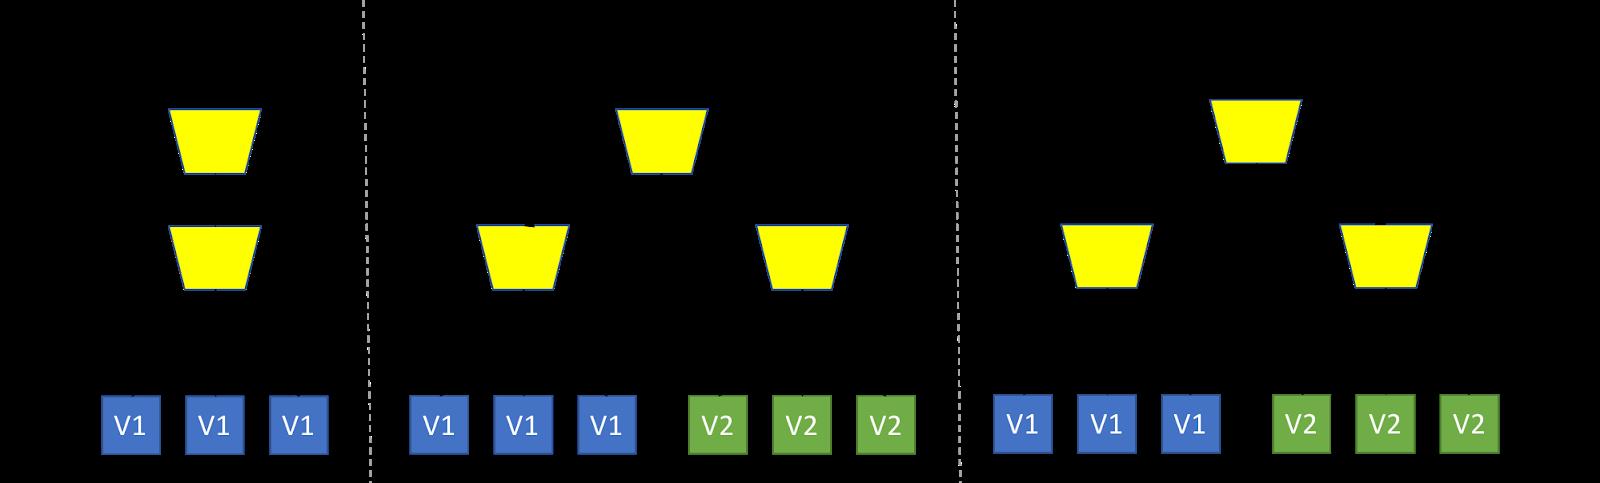 blue-green-deployment.png